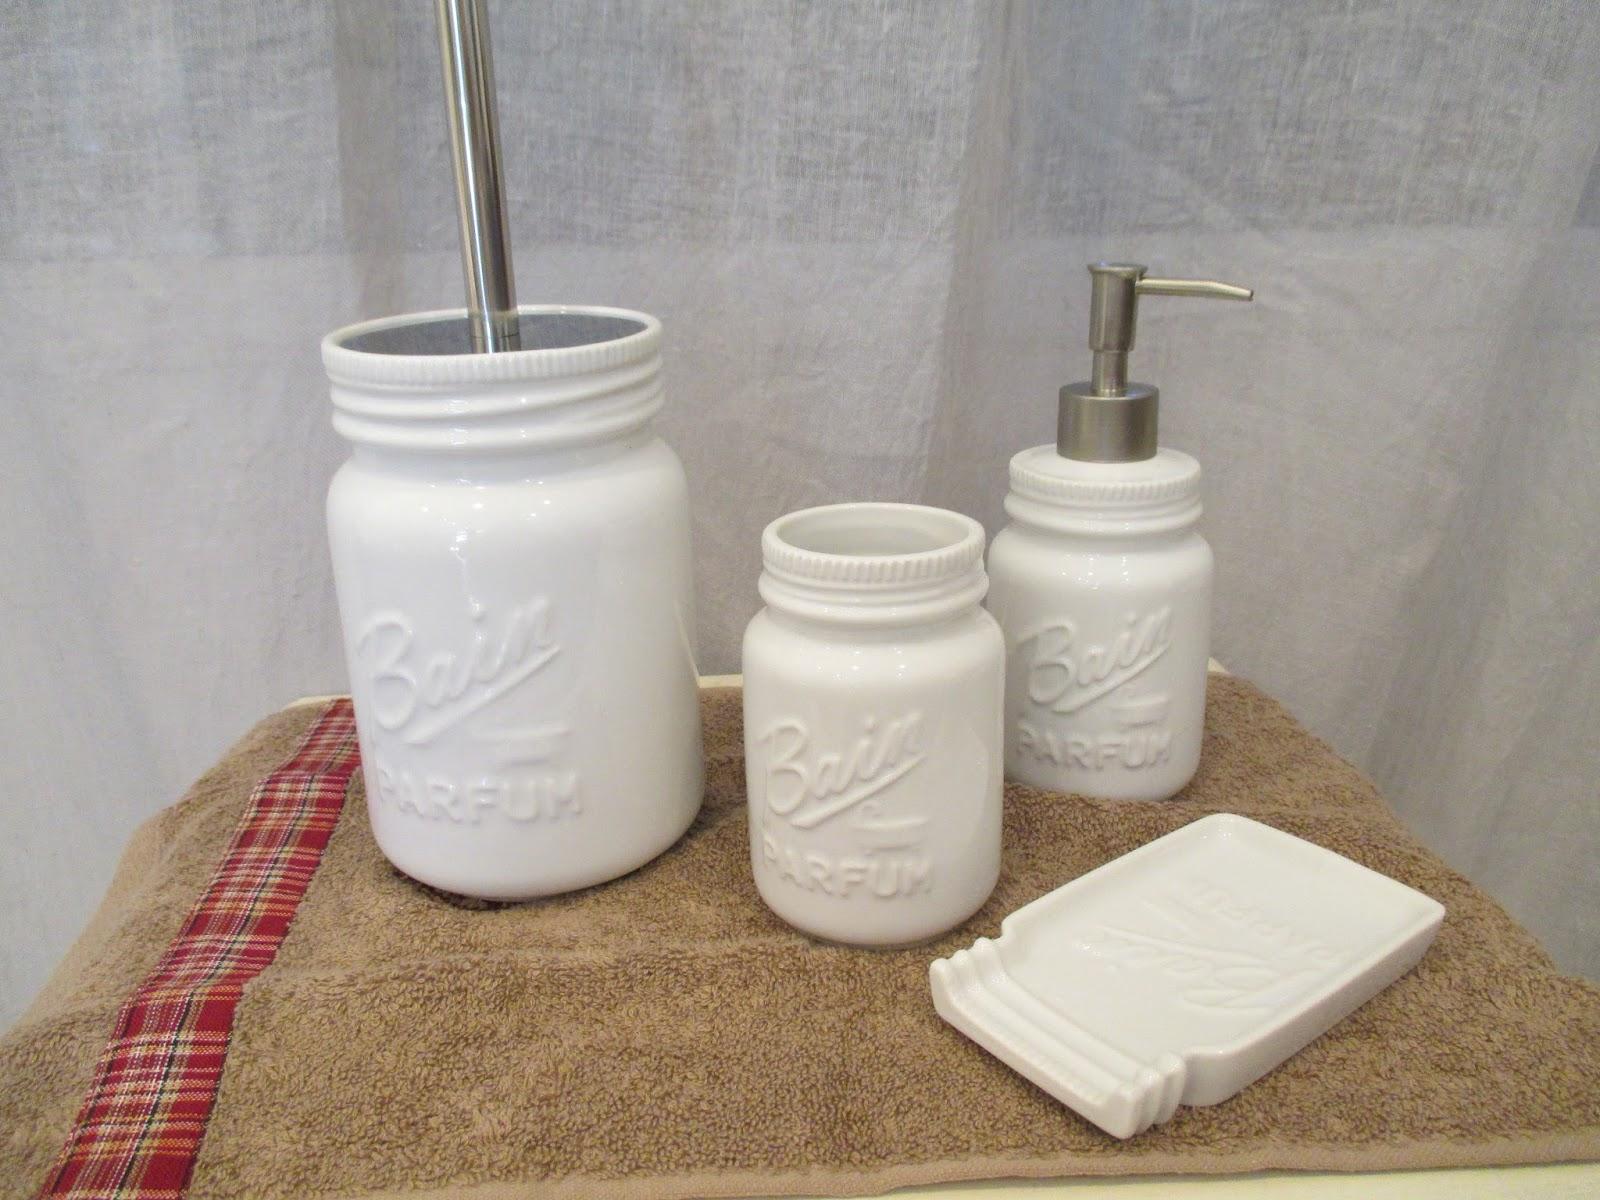 Le Bain Accessori Bagno.Le Bain Accessori Bagno Porta Spazzolini In Ceramica Le Bain H Cm